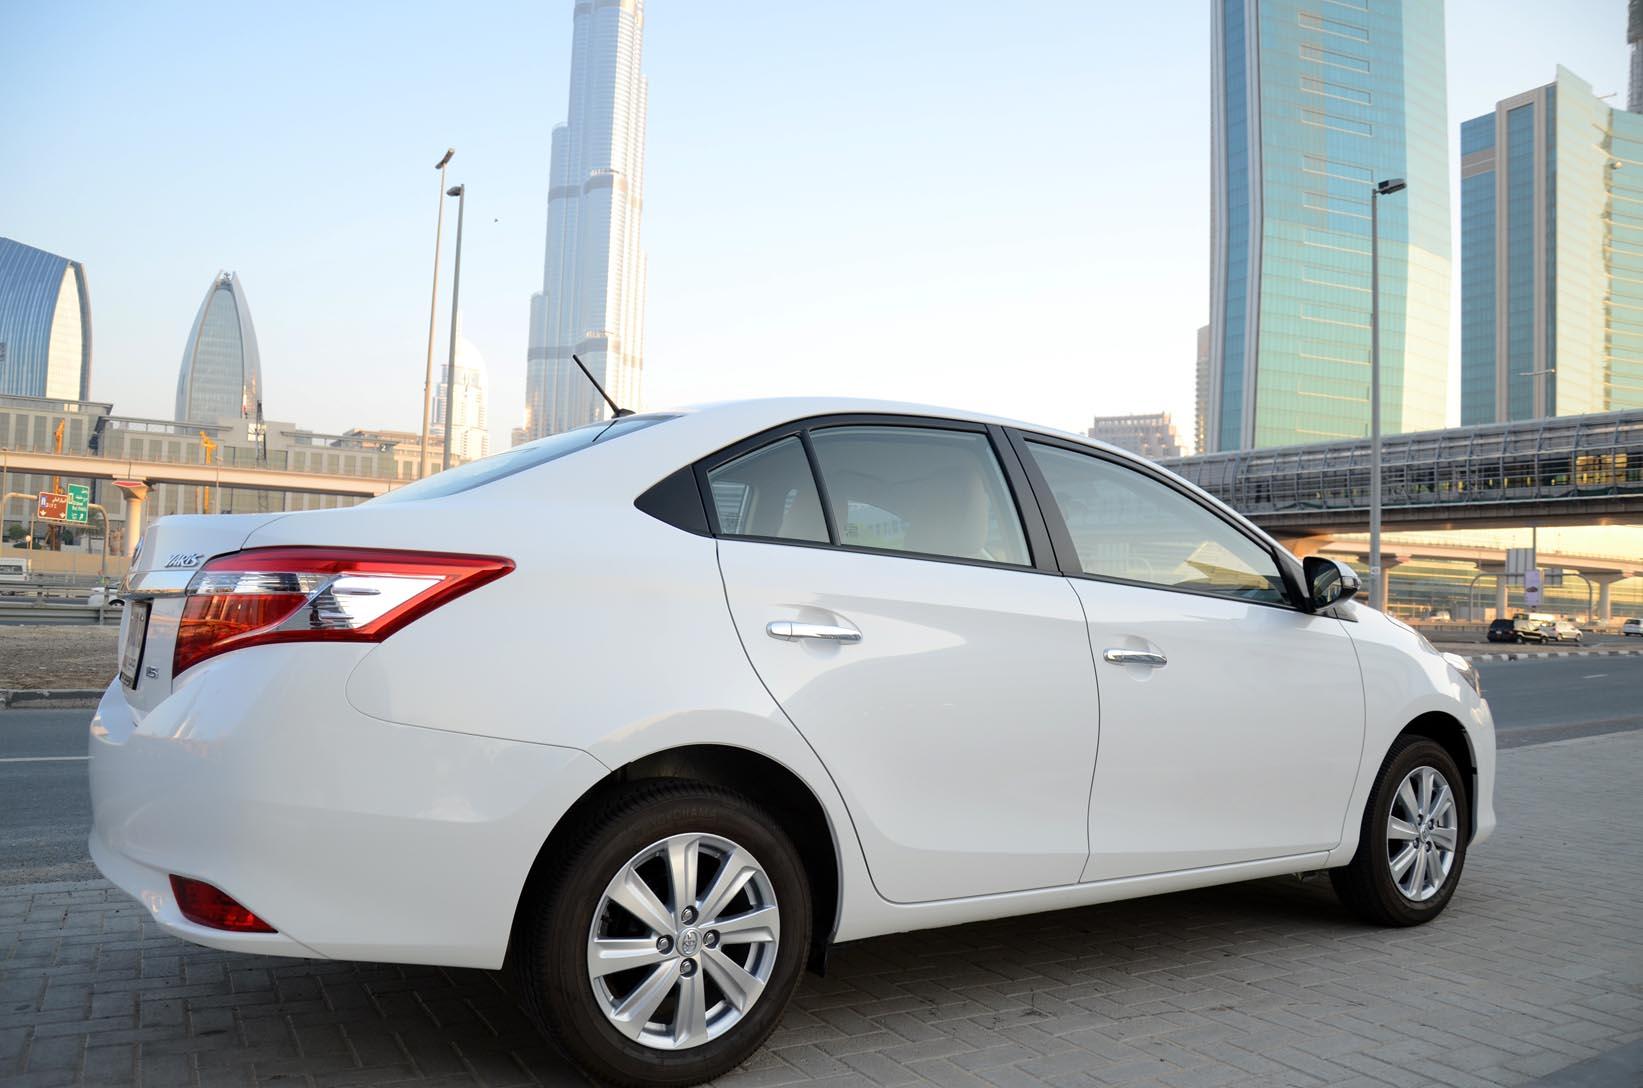 Toyota Yaris 2014 Sedan Review Basic Plus Drivemeonline Com